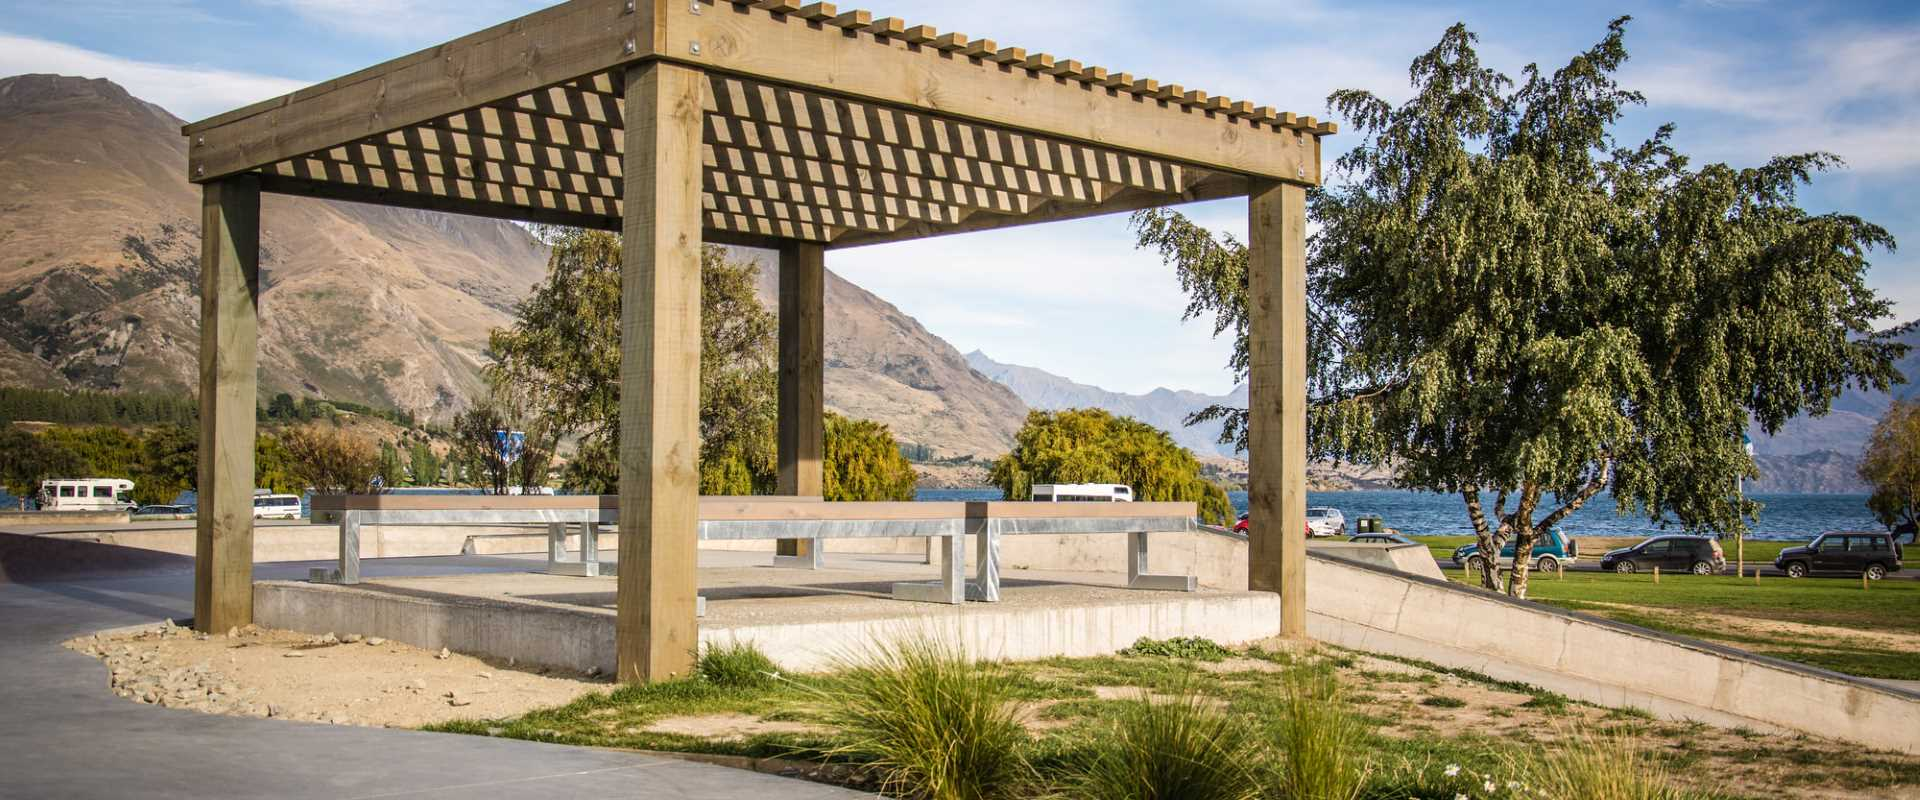 Skate Park Bench Seats